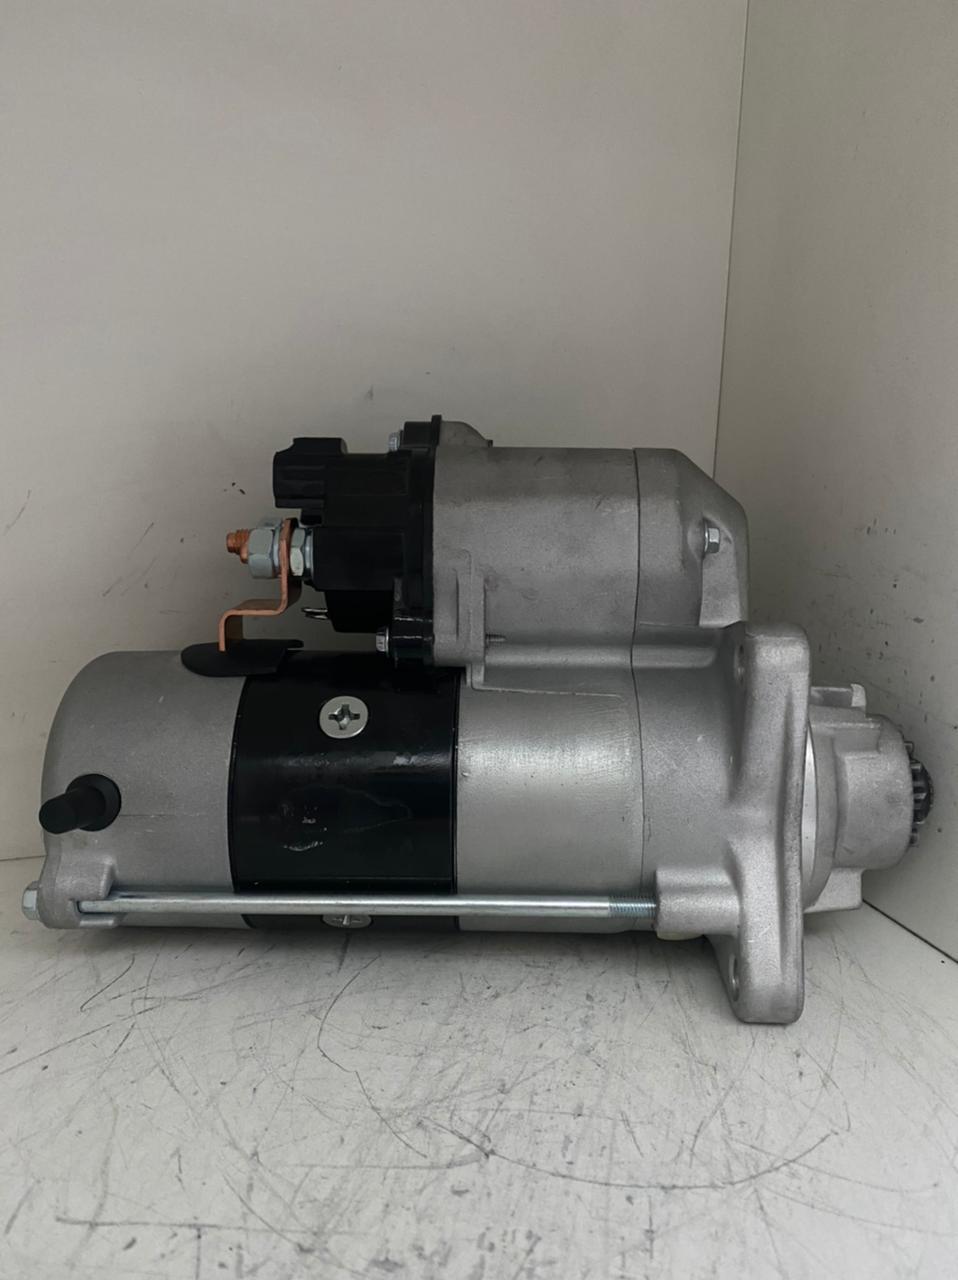 Motor de arranque DODGE RAM 2010 em diante Motor Cummins Diesel DENSO 12V 13 DENTES 4934925 68002981AA 19029N 4280003330 4280003331 4280006110 AEC11103